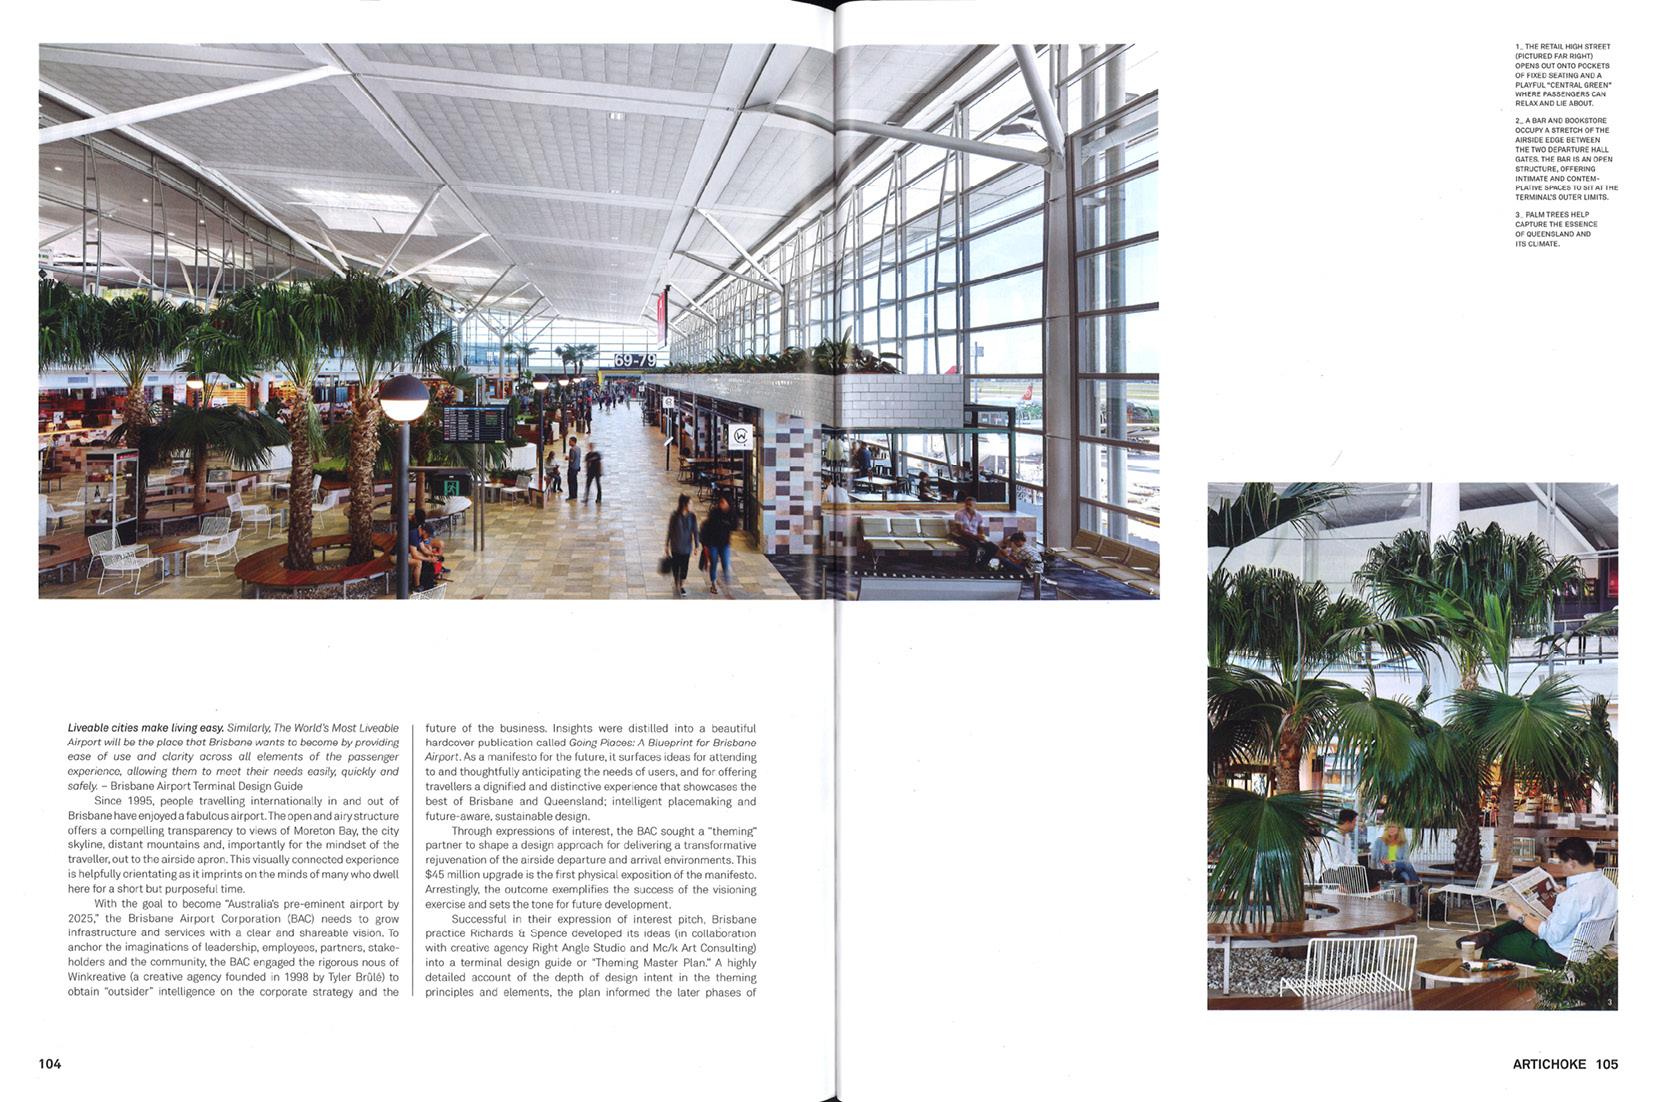 160901_ARTICHOKE_Brisbane_International_Airport_Retail_Upgrade_SPREAD_2.jpg